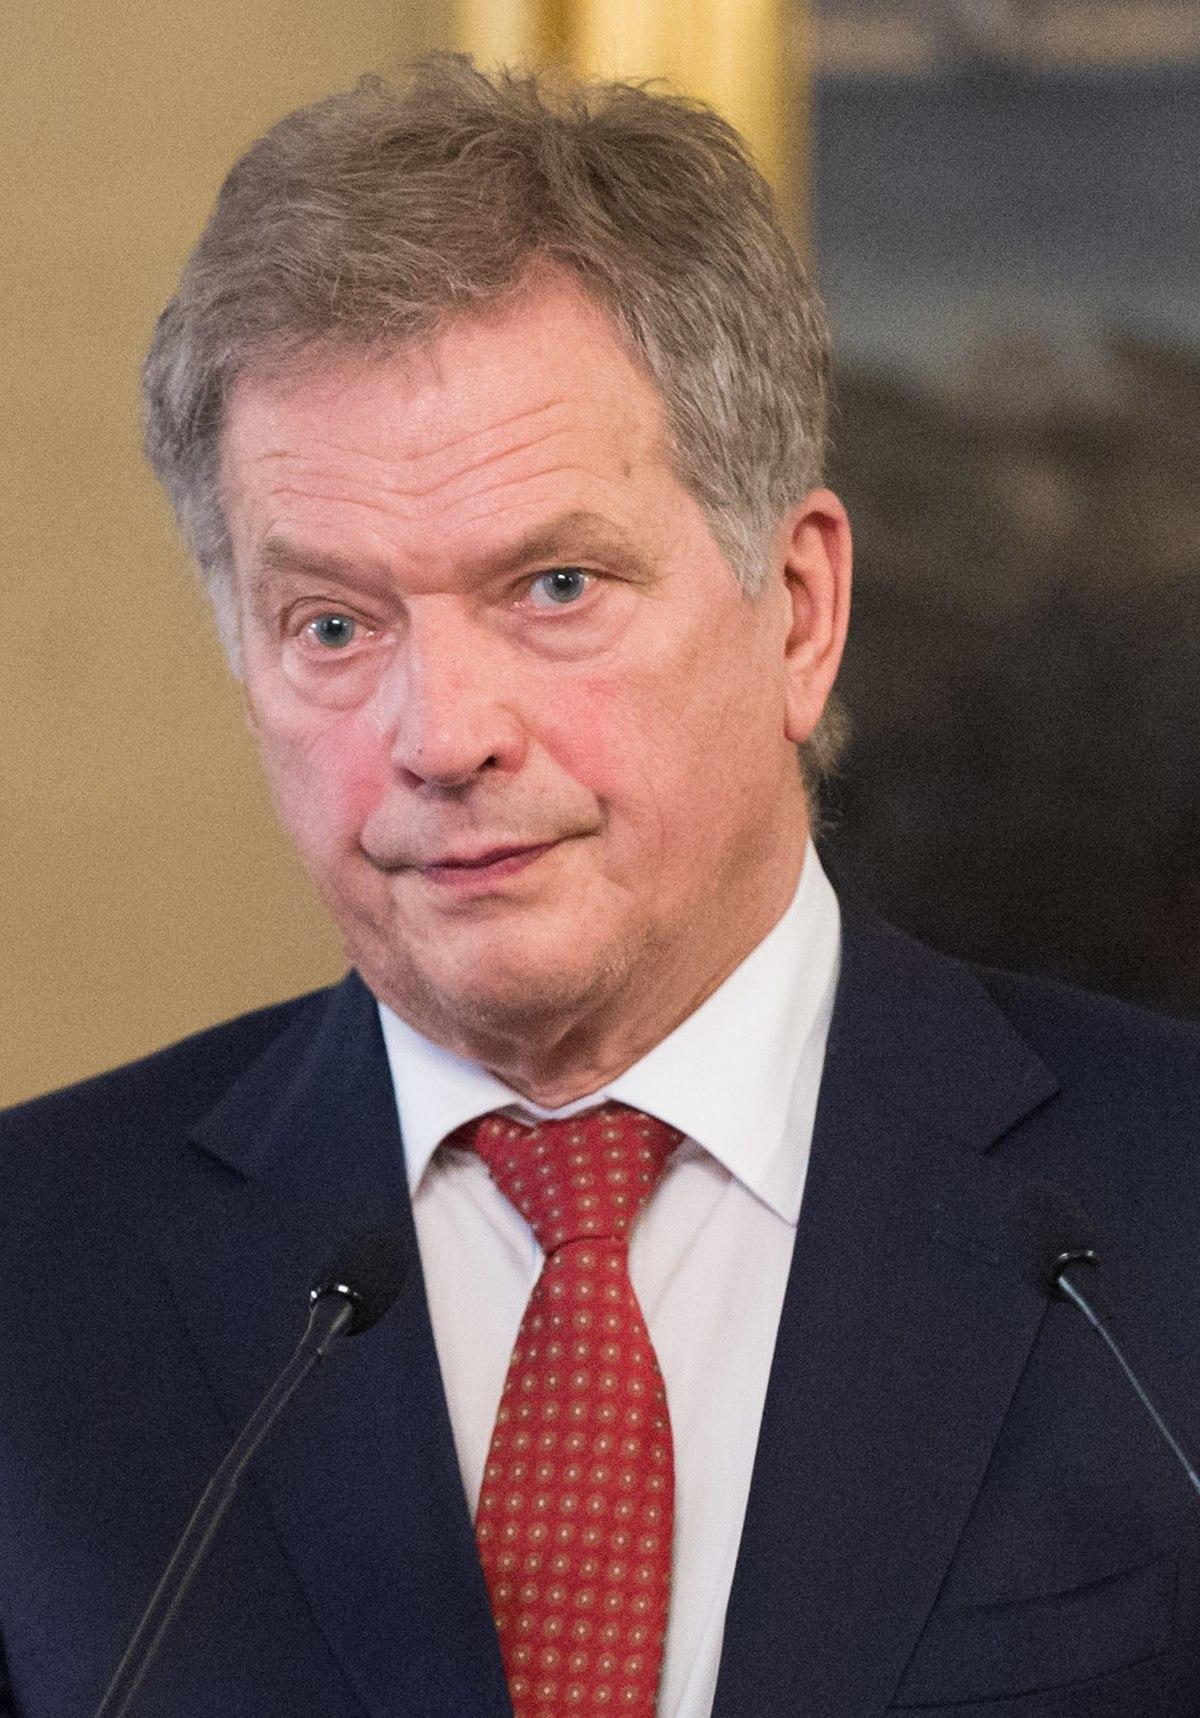 Suomen Presidentit Wiki